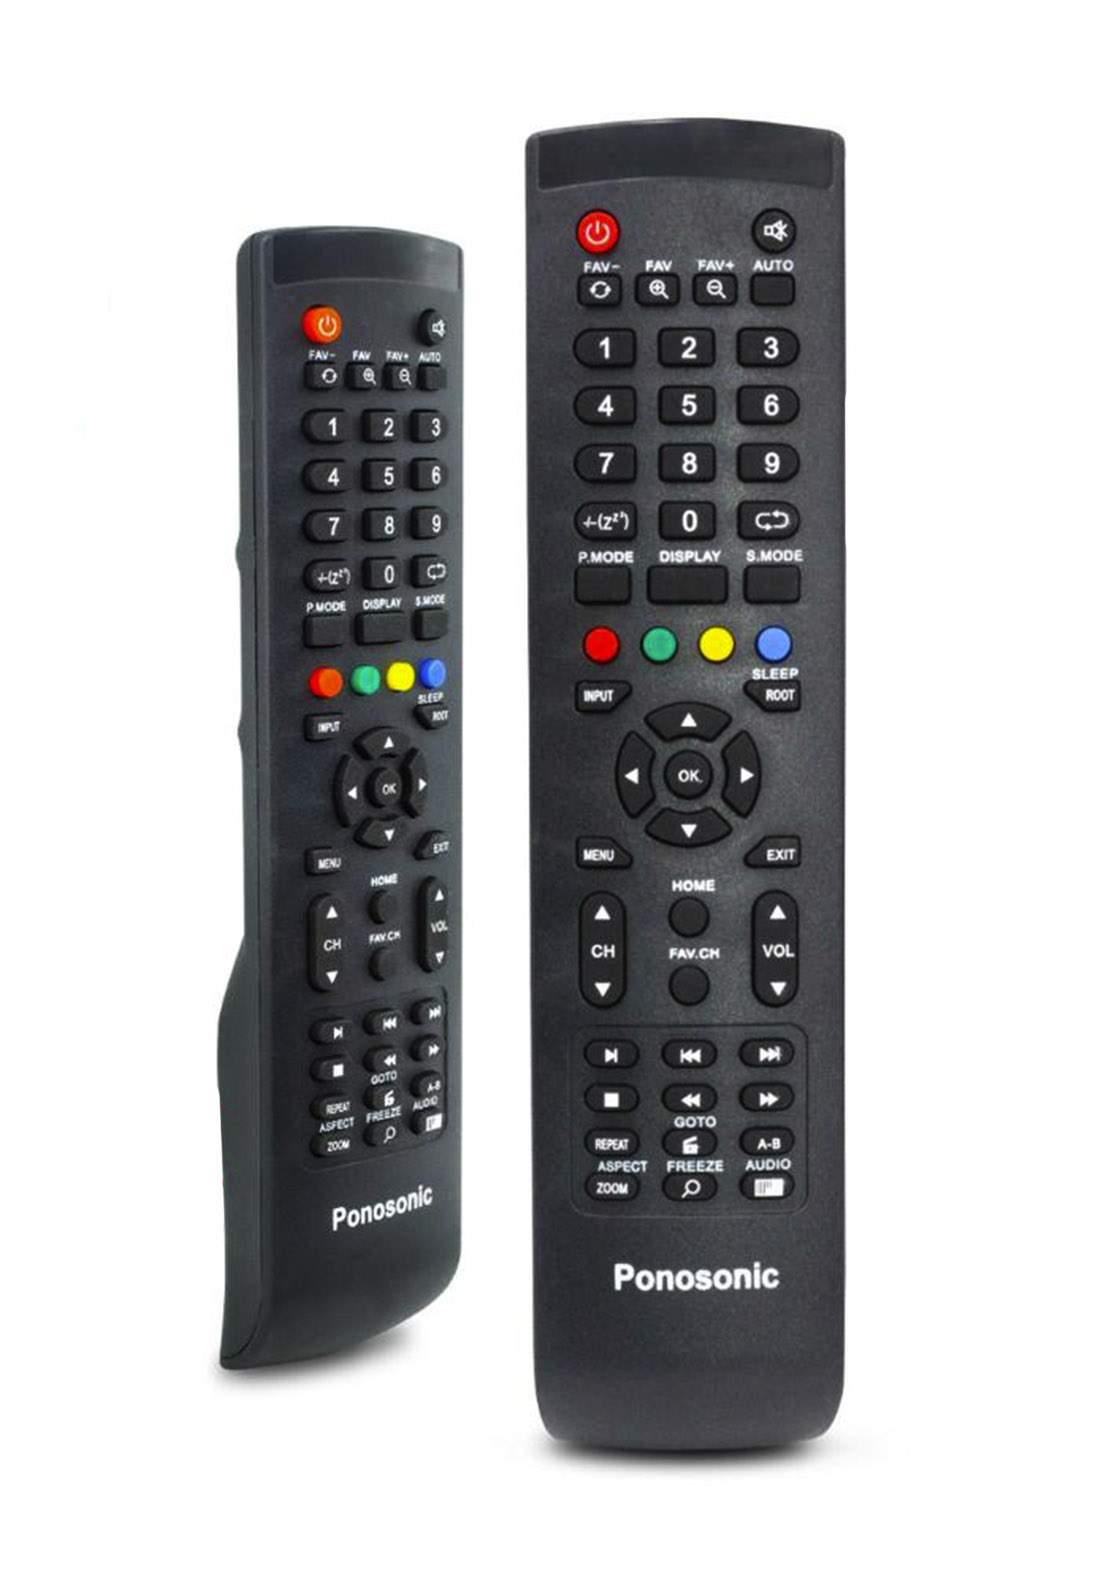 Remote Control For Ponosonic Plasma TV (B-009) جهاز تحكم عن بعد